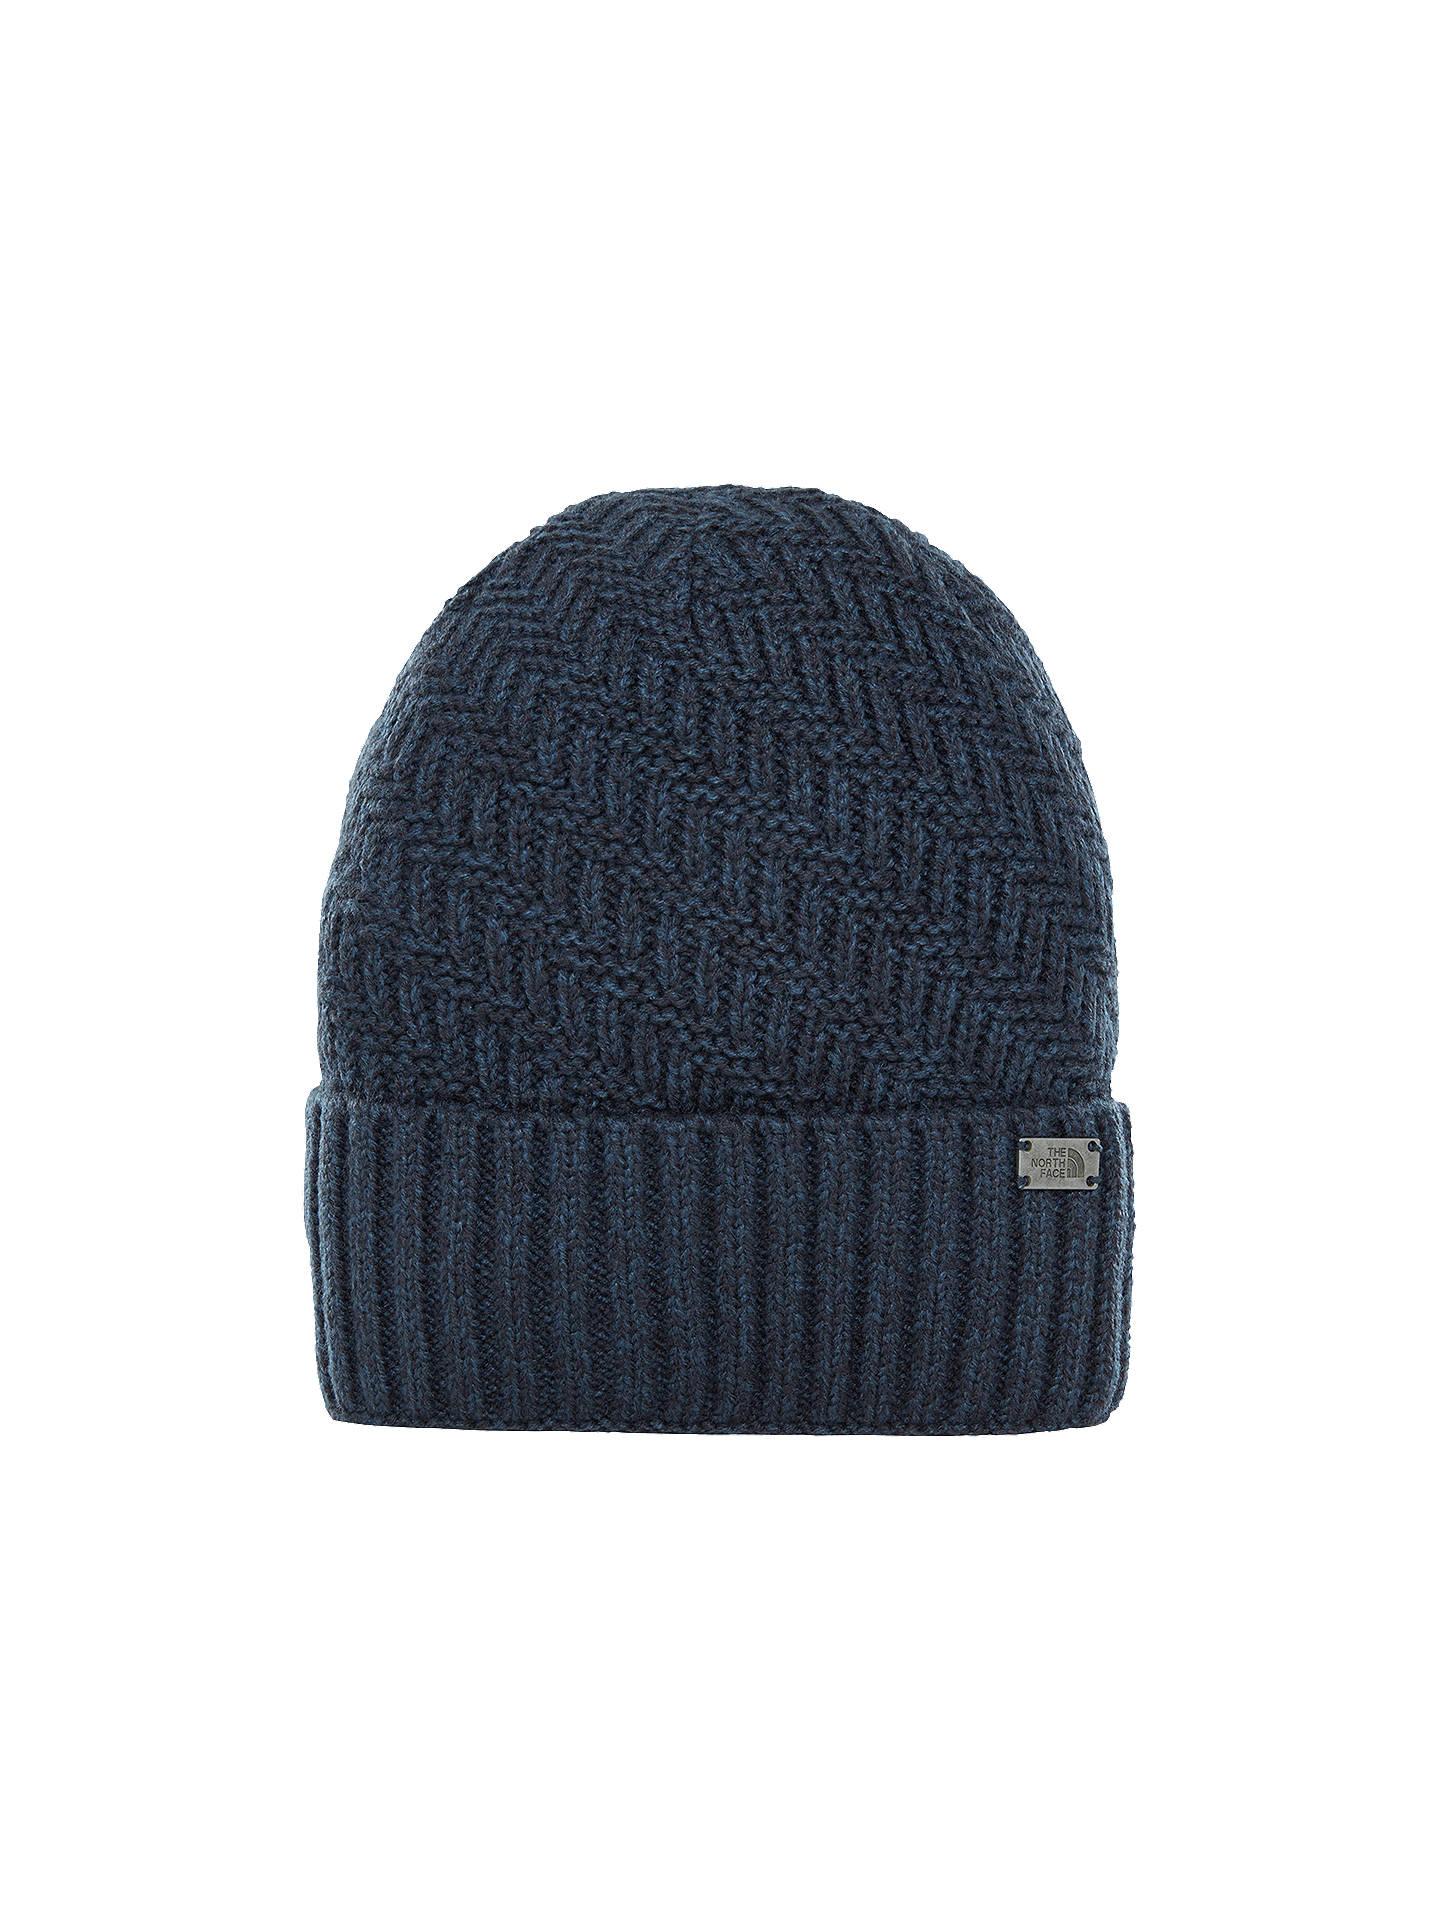 0dd1843340125 Buy The North Face Reyka Beanie Hat